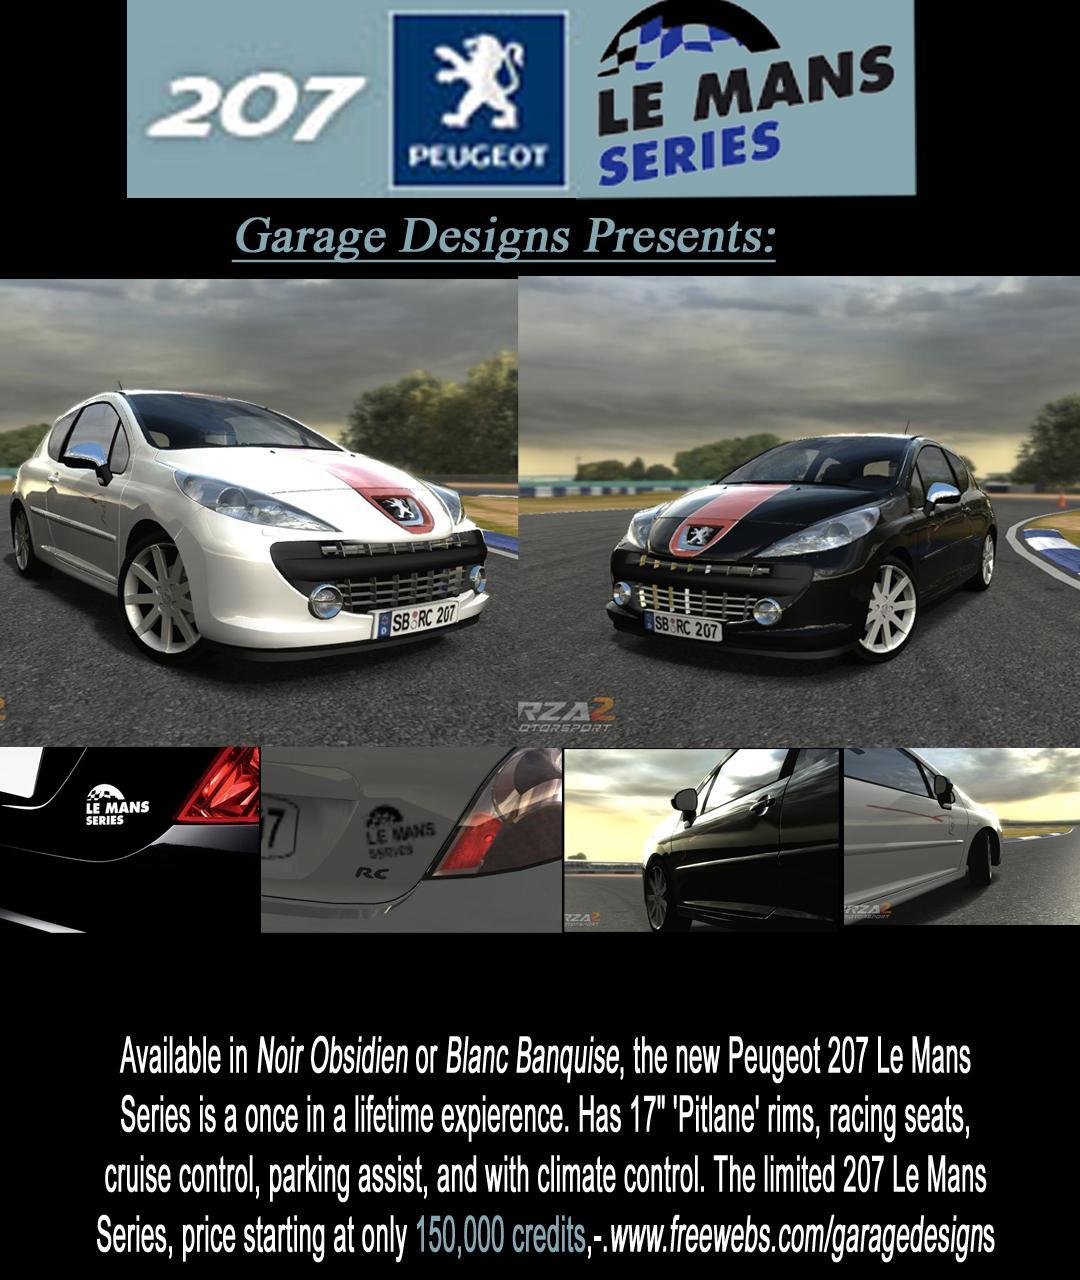 peugeot 207 le mans series picture 1 reviews news specs buy car. Black Bedroom Furniture Sets. Home Design Ideas